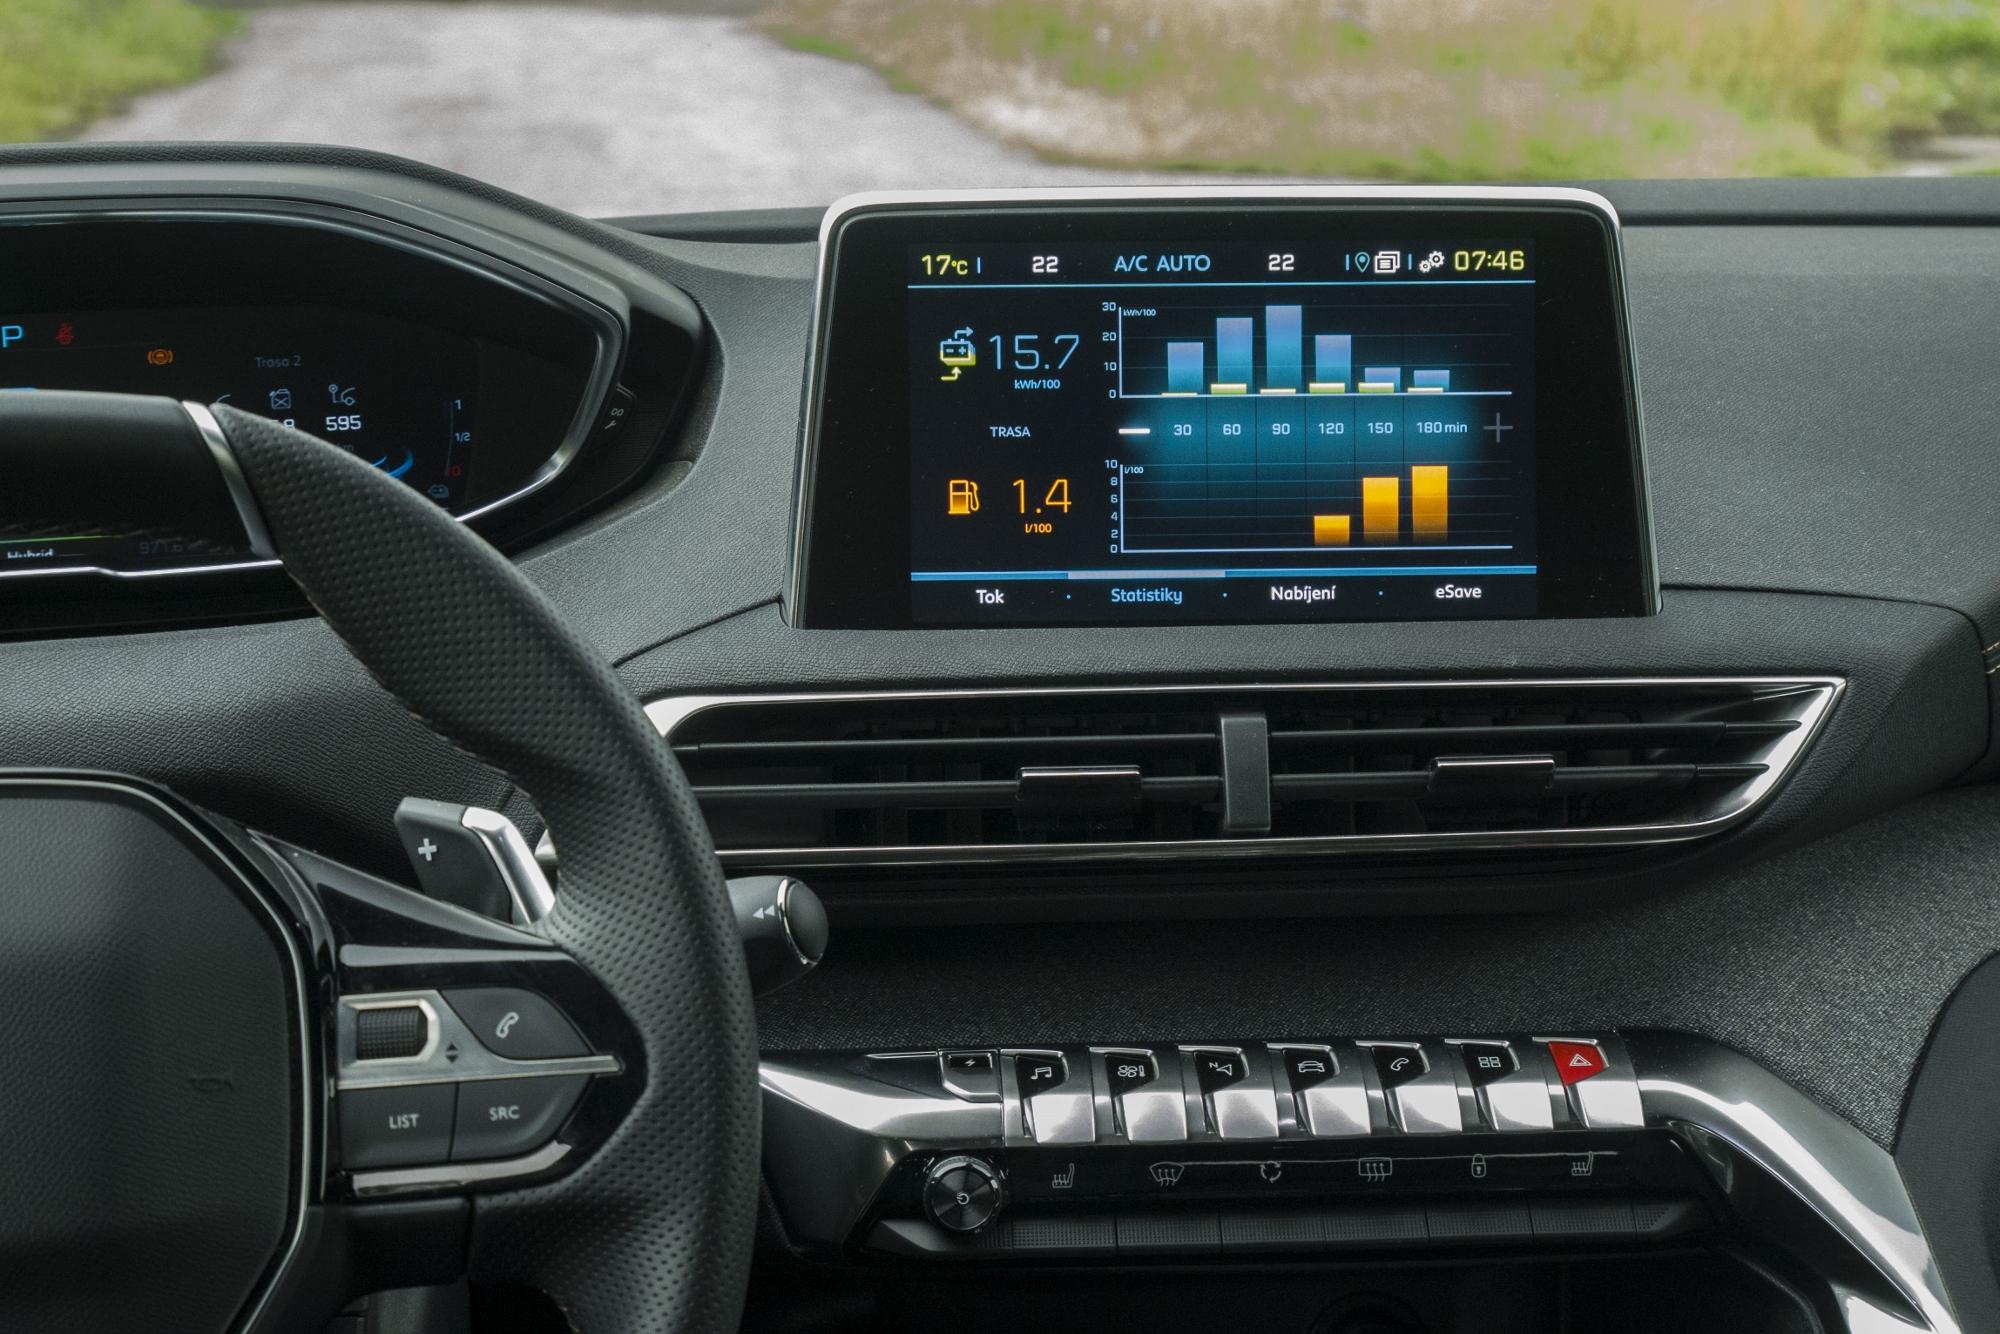 Test: Peugeot 3008 posúva schopnosti plug in hybridov xu65QfVdTX peugeot-3008-hybrid4-9